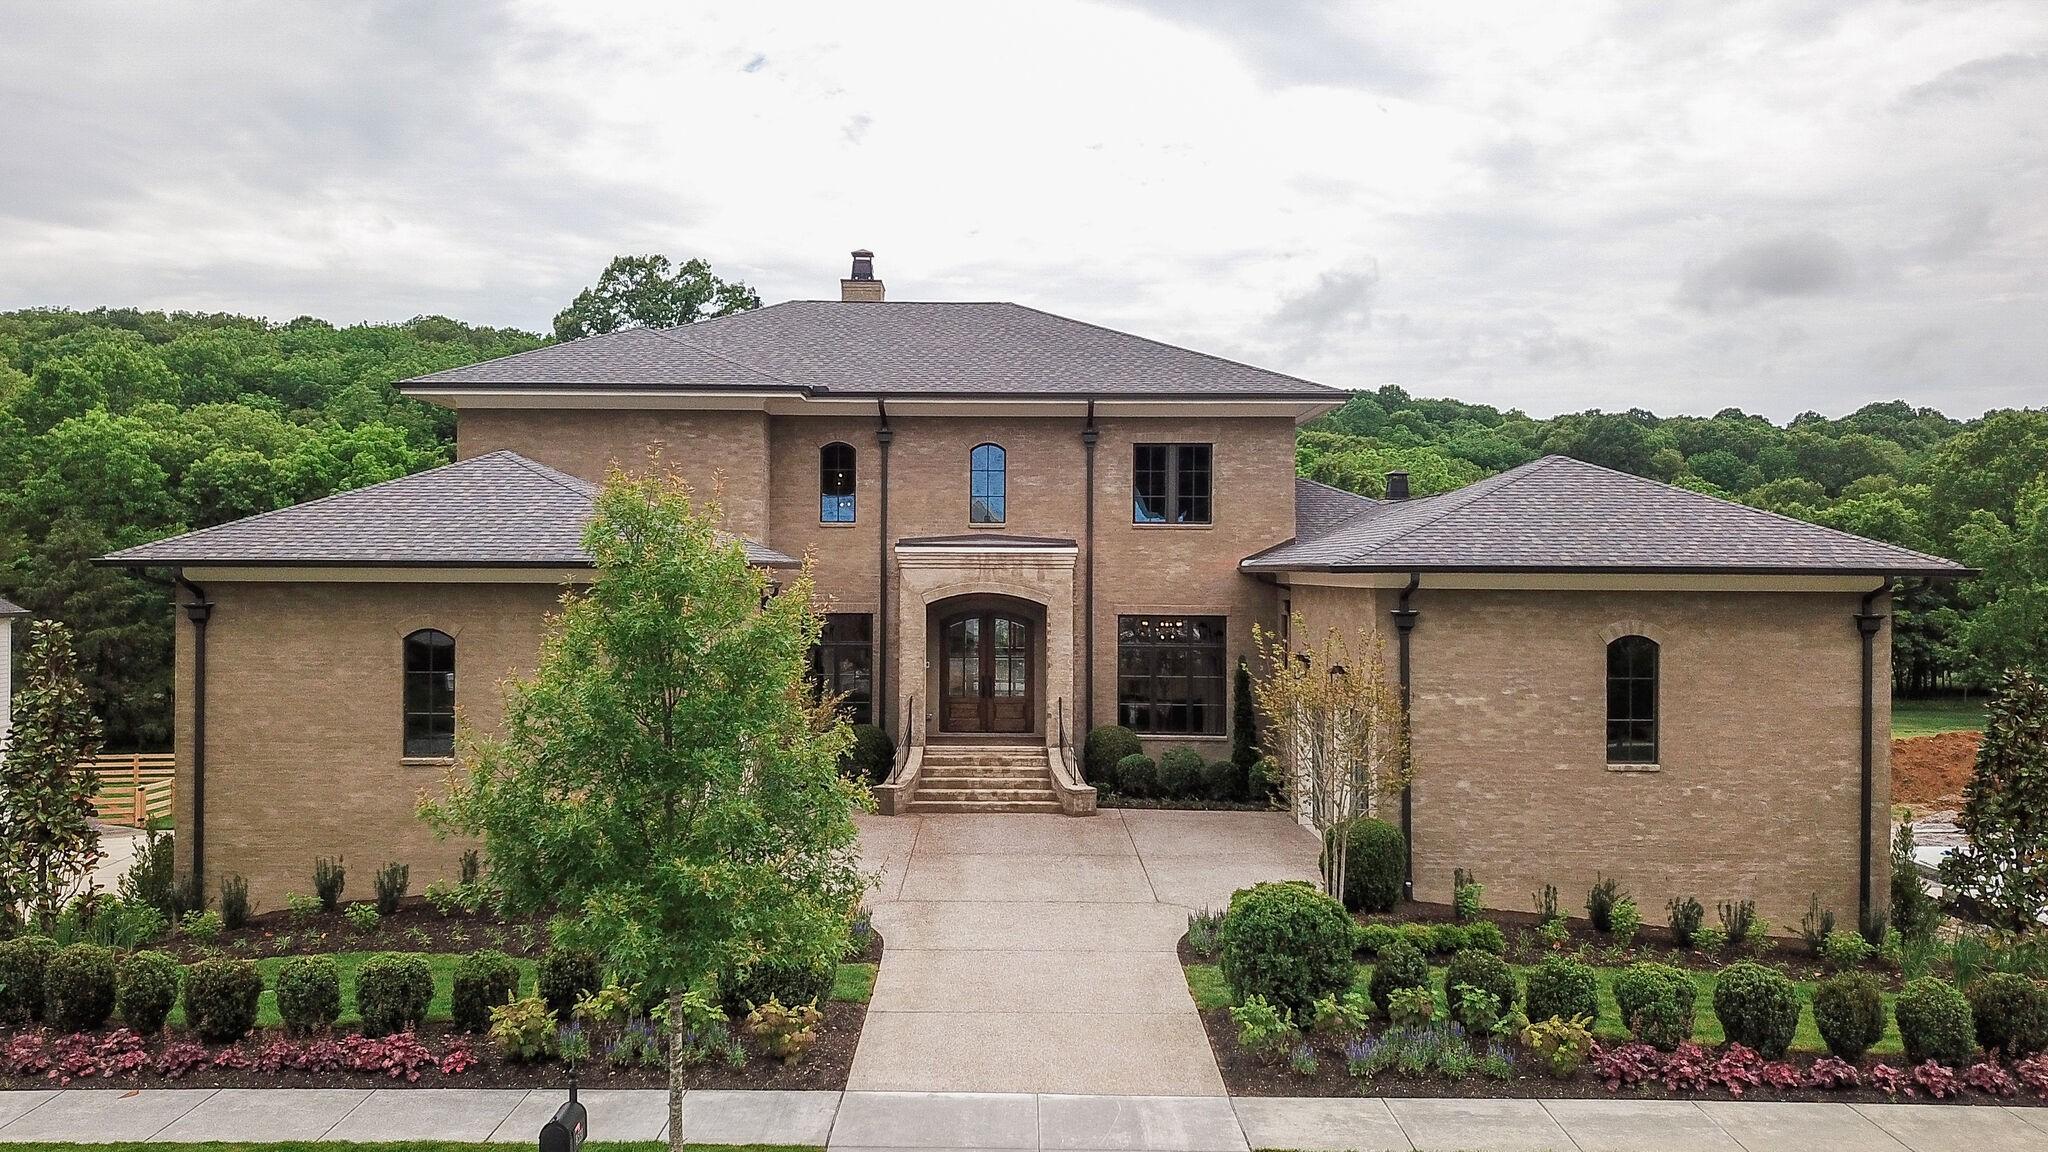 8531 Heirloom Blvd (Lot 7007), College Grove, TN 37046 - College Grove, TN real estate listing